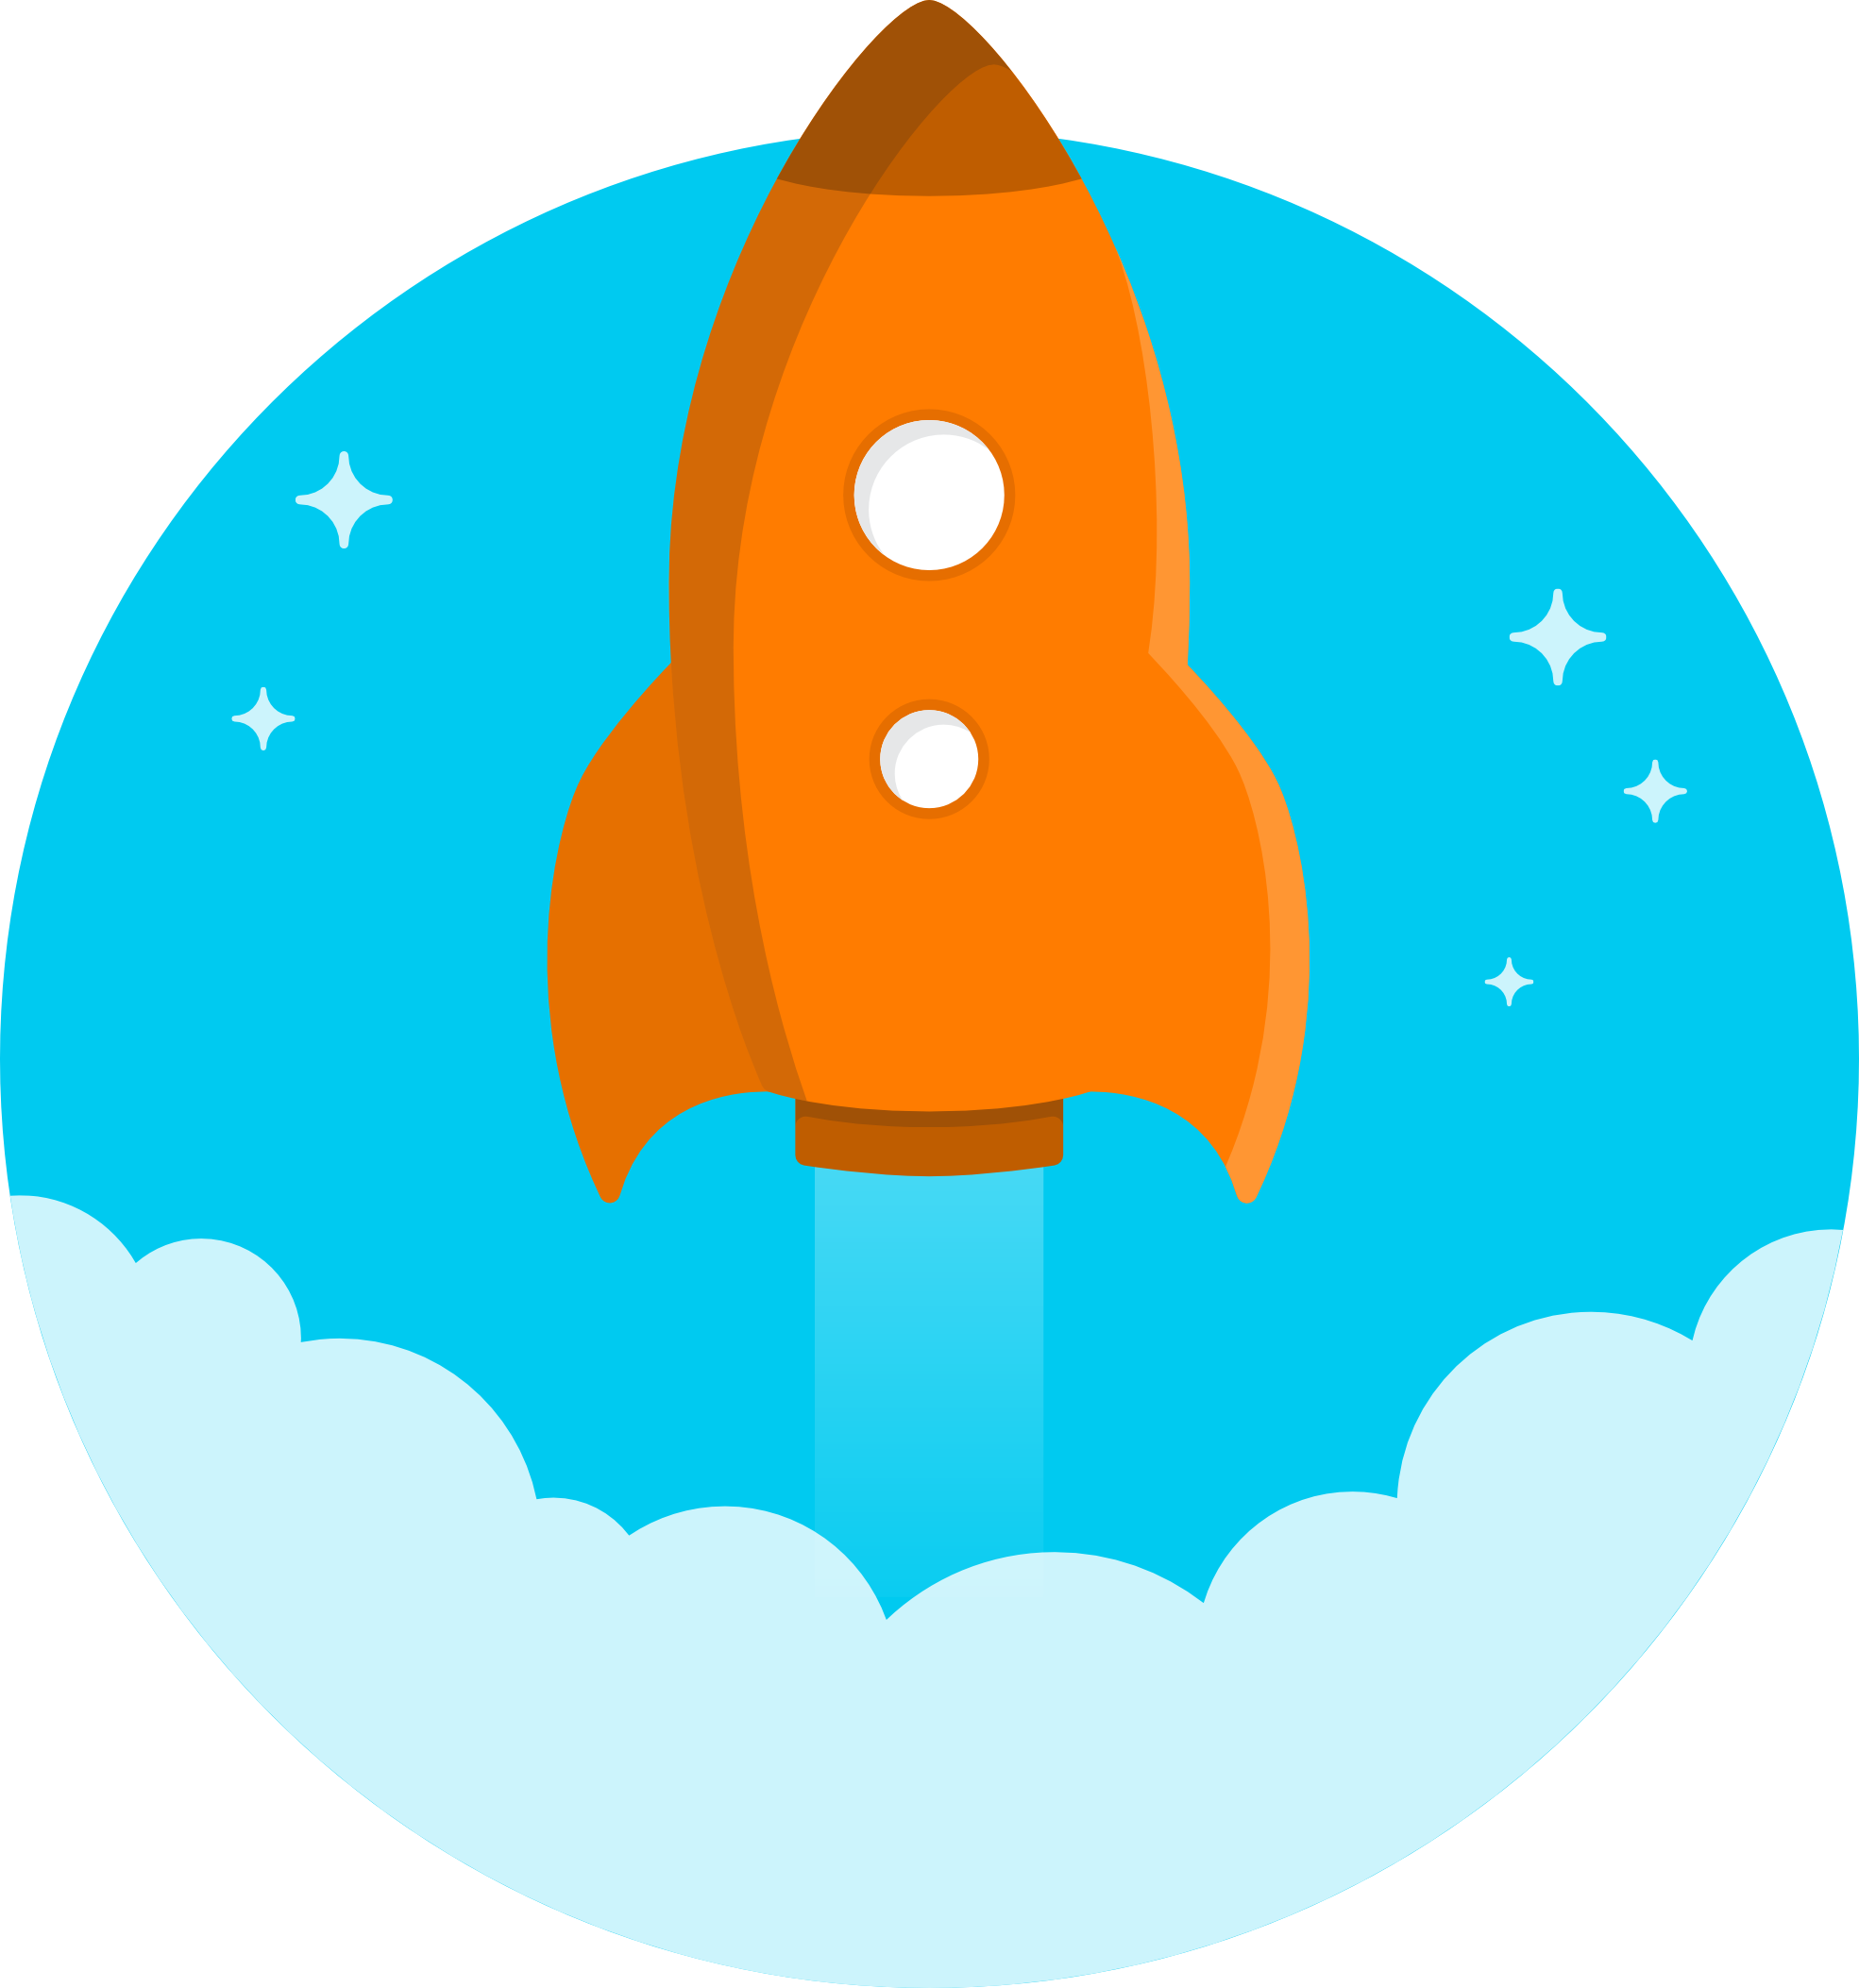 Rocket clip art free clipart images 6 2